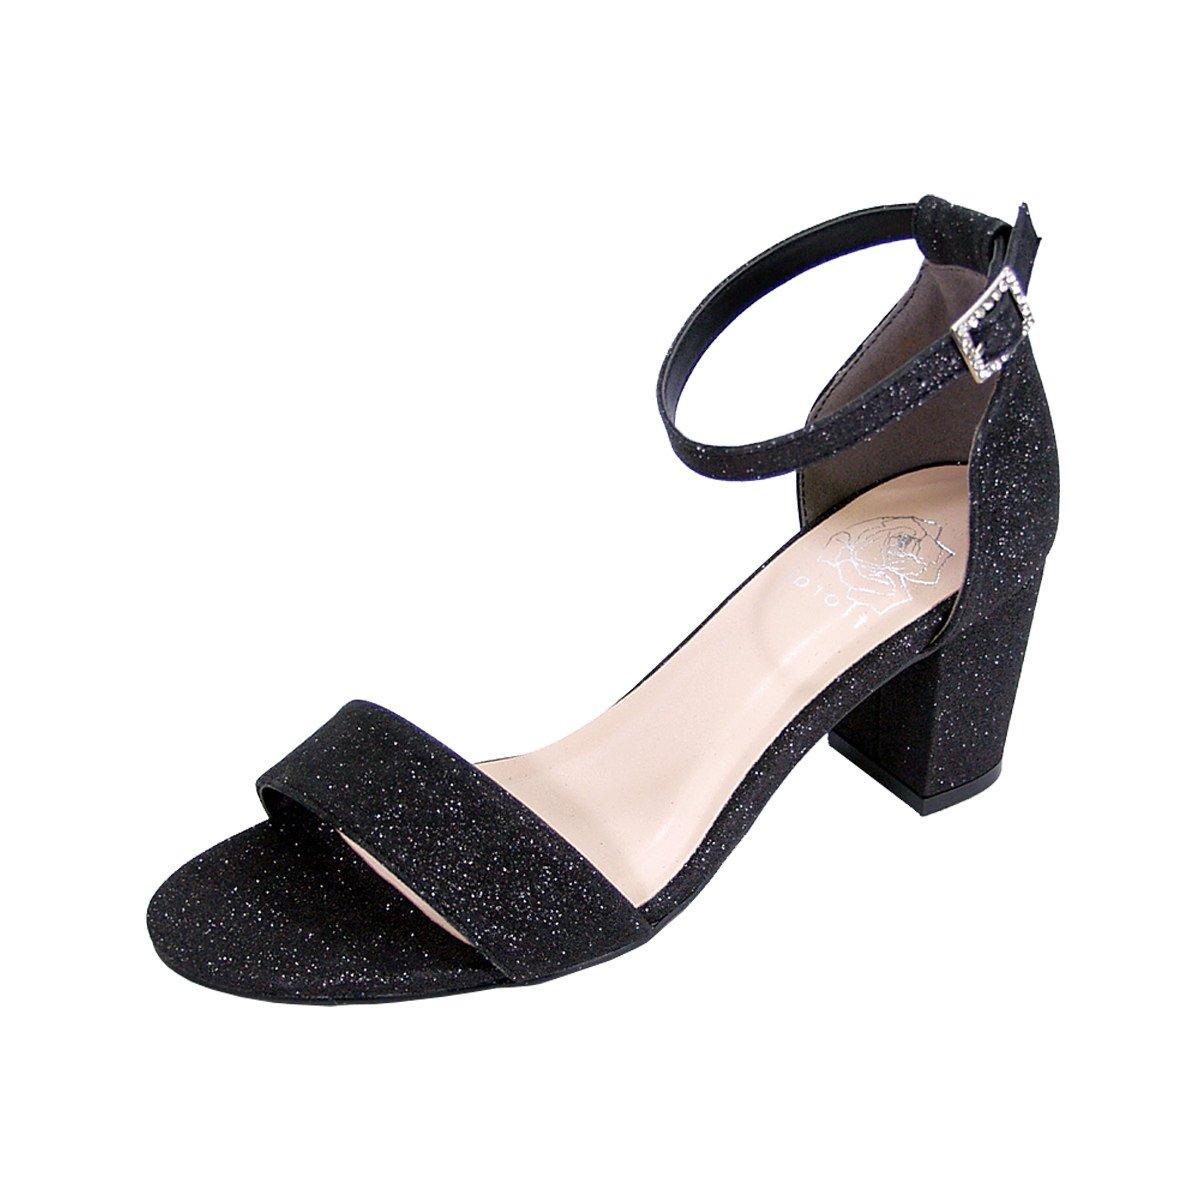 Women's Adele Black Glitter Satin Wide Width Block Heel Ankle Strap Dress Sandals - DeluxeAdultCostumes.com